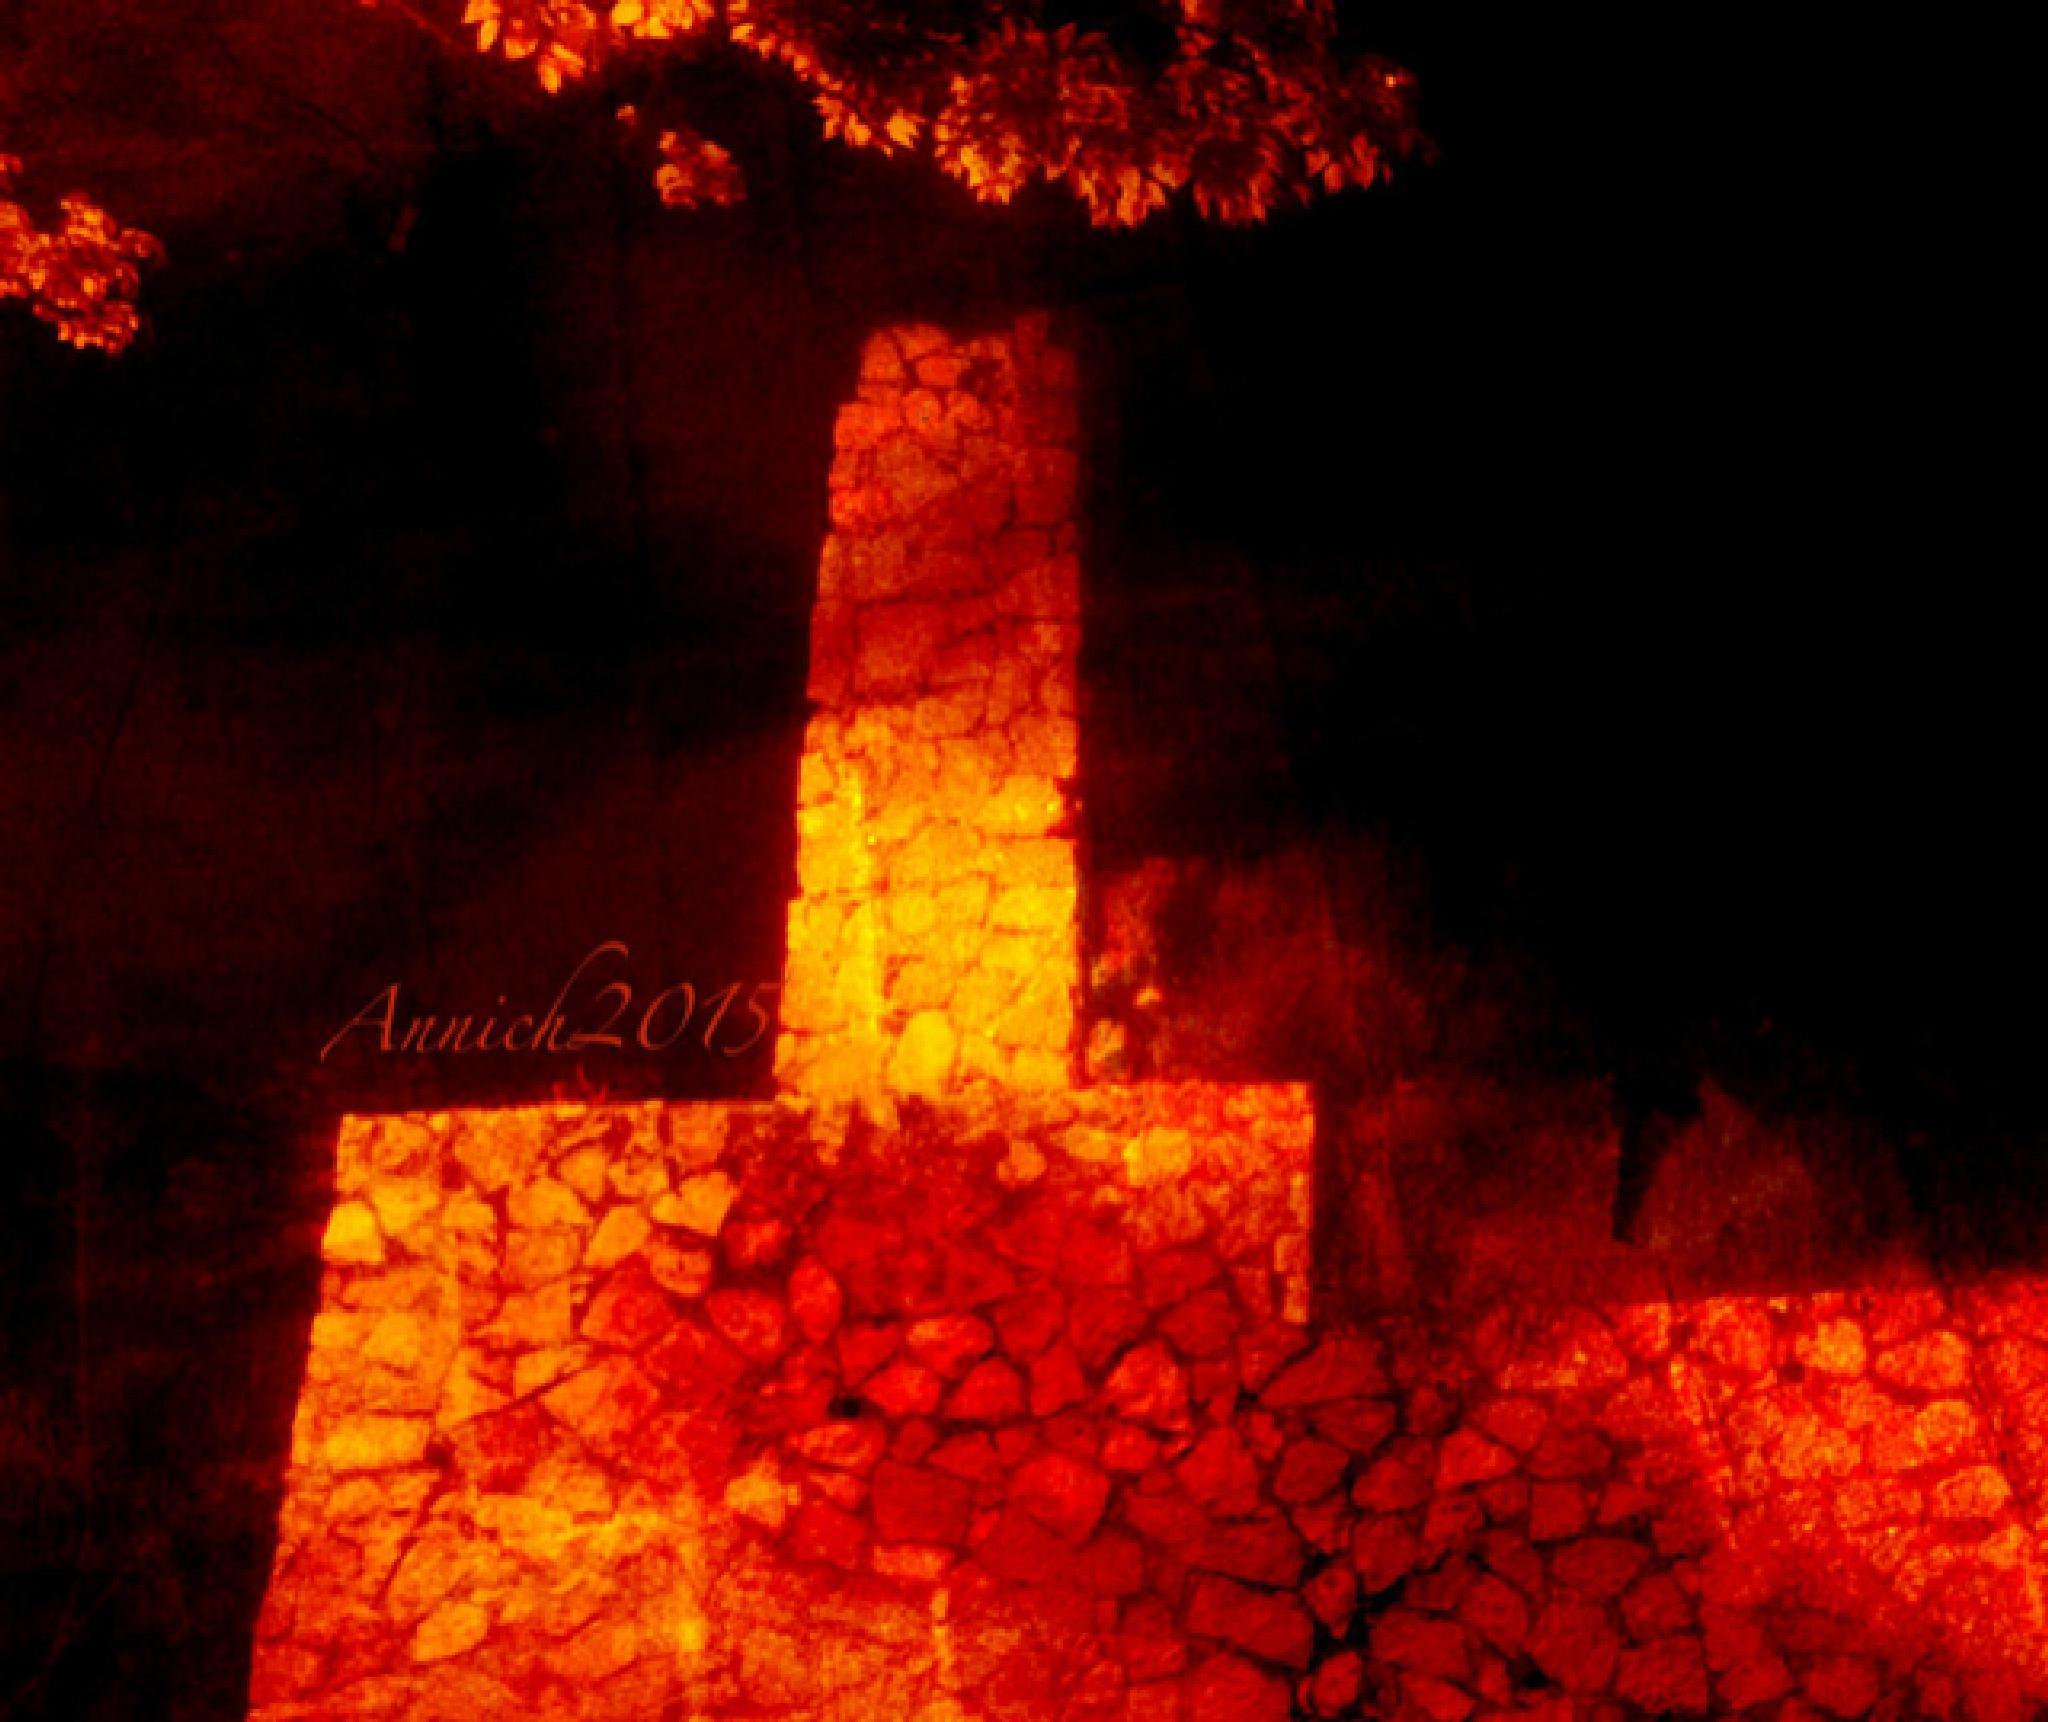 firewall by Annich